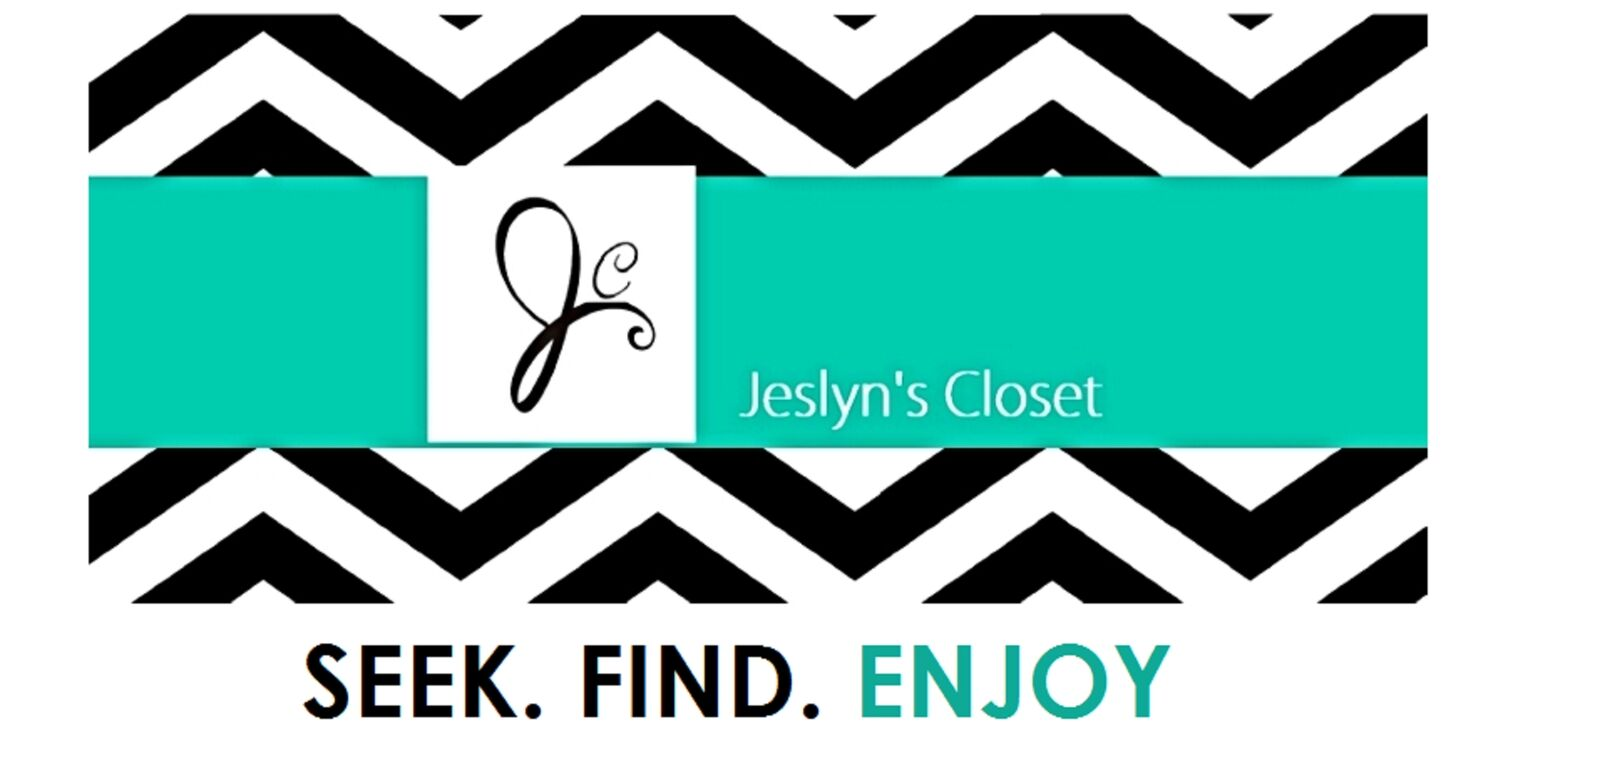 Jeslyn's Closet